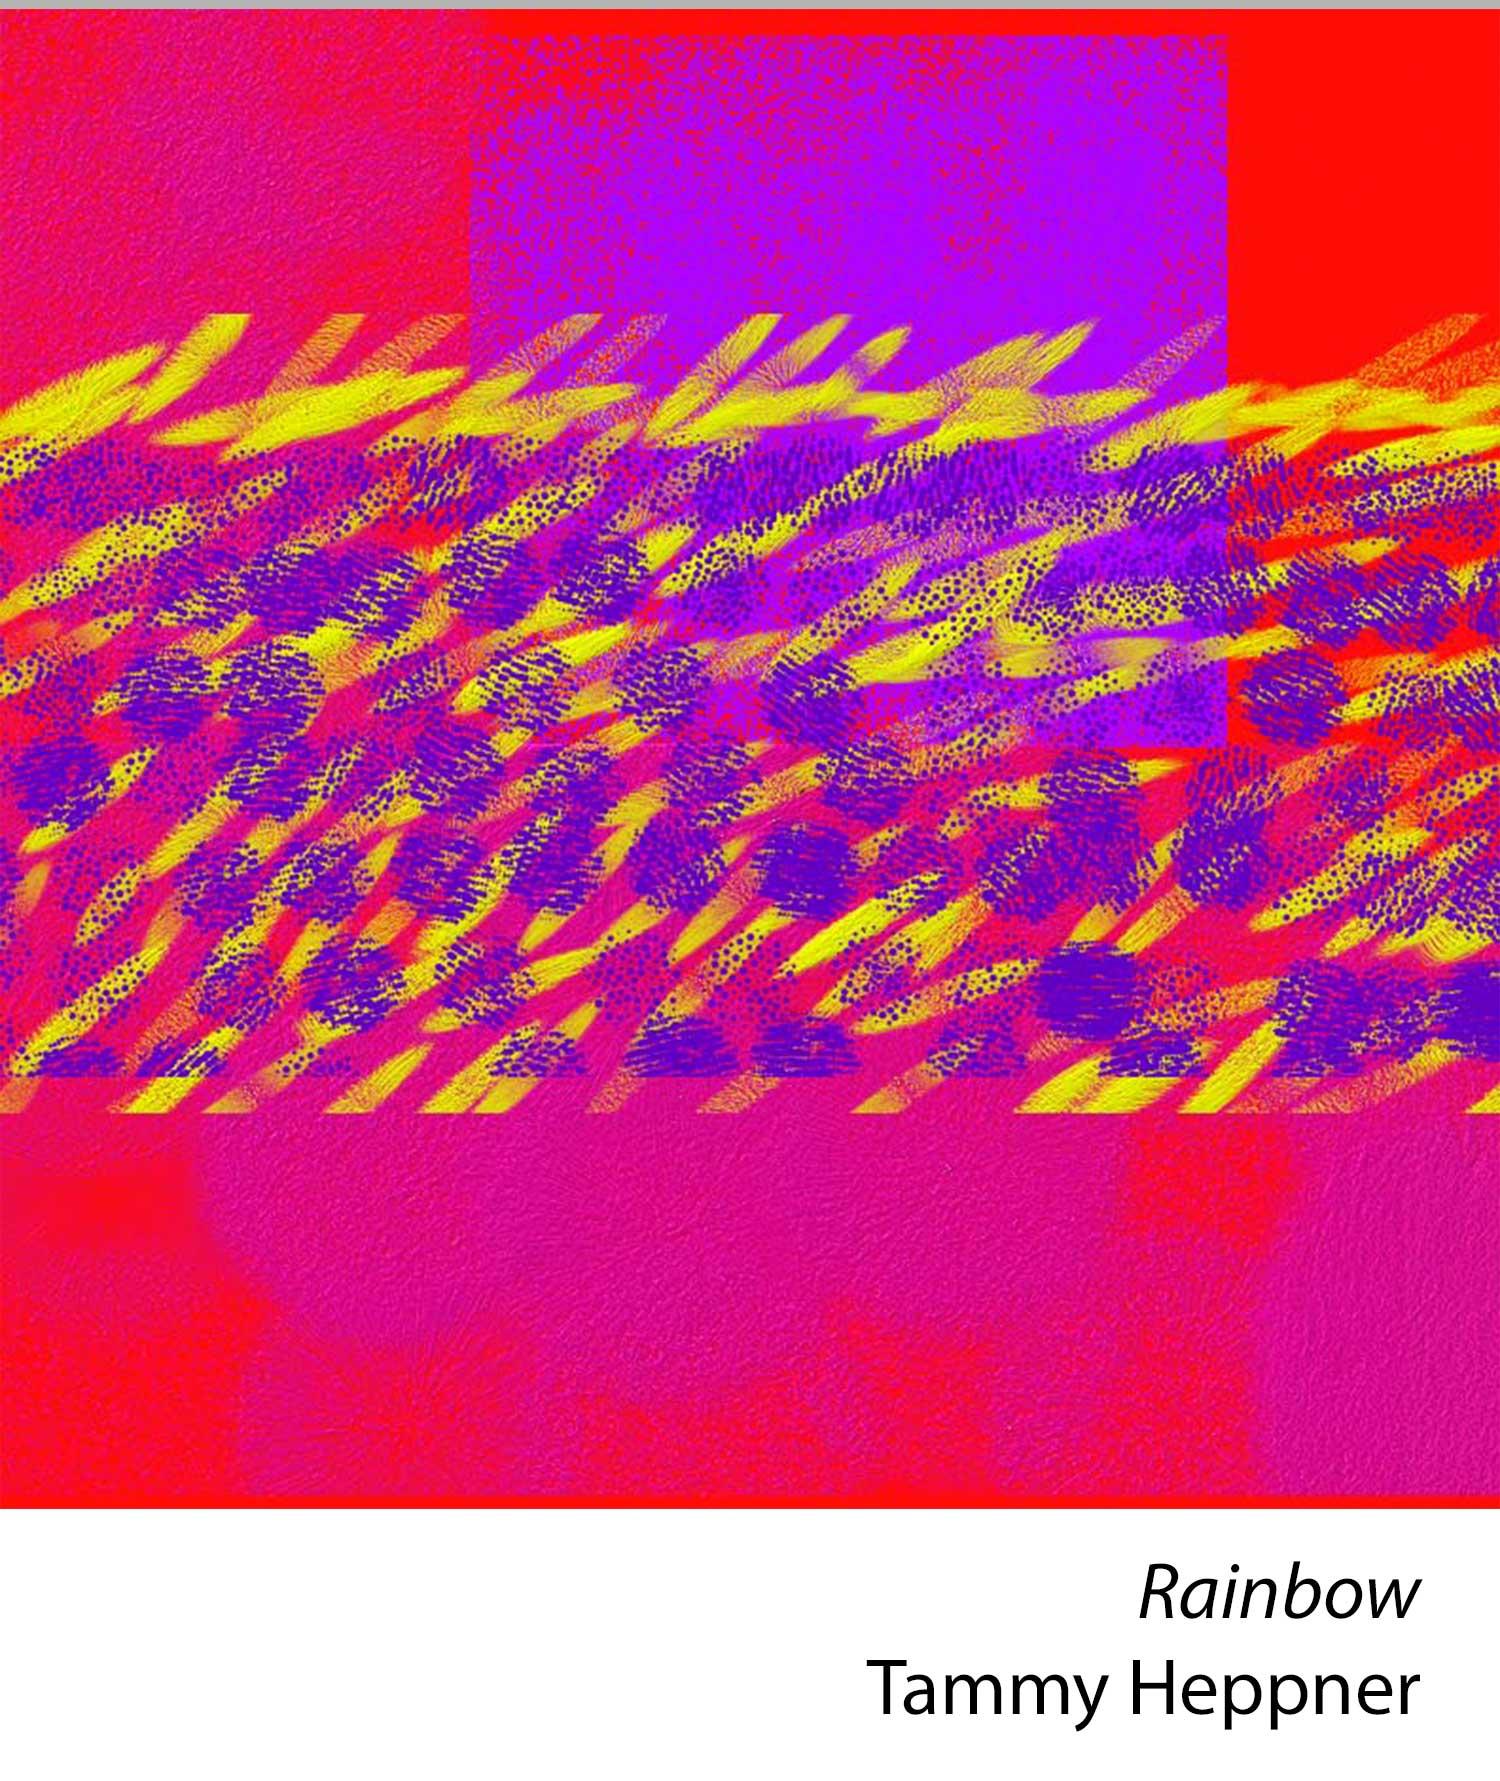 Rainbow by Tammy Heppner